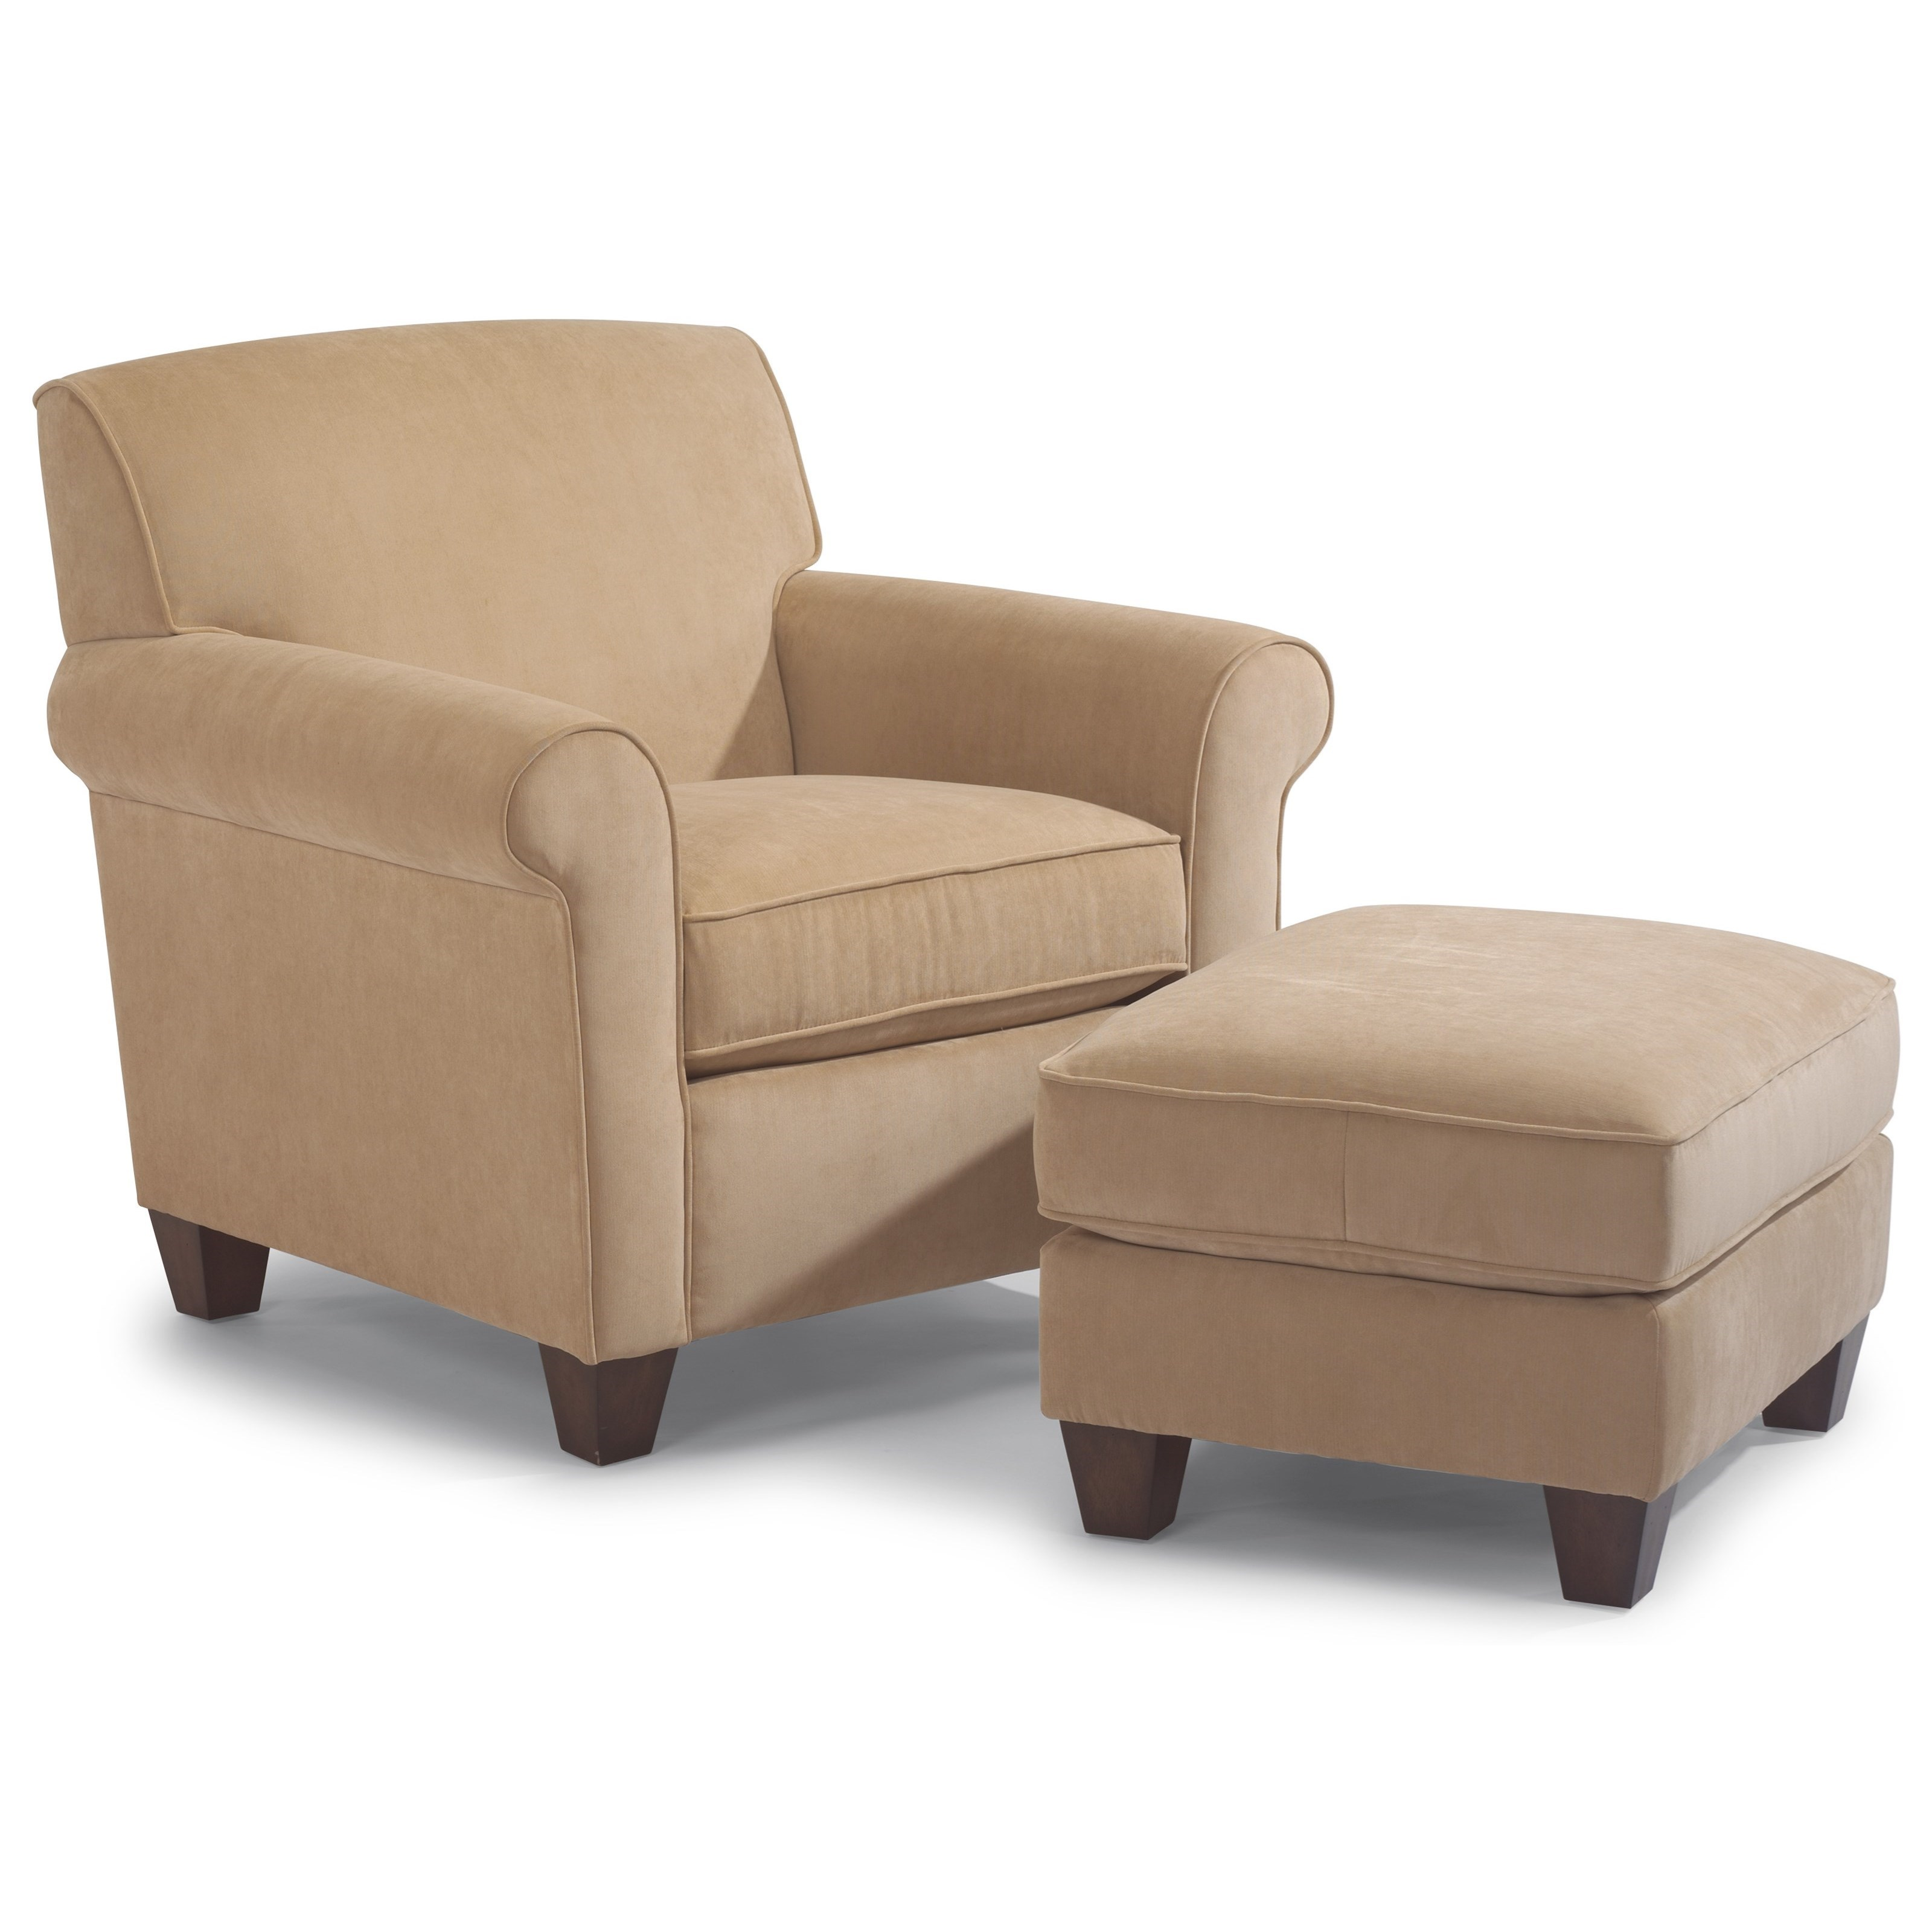 Flexsteel Dana Upholstered Chair And Ottoman Furniture